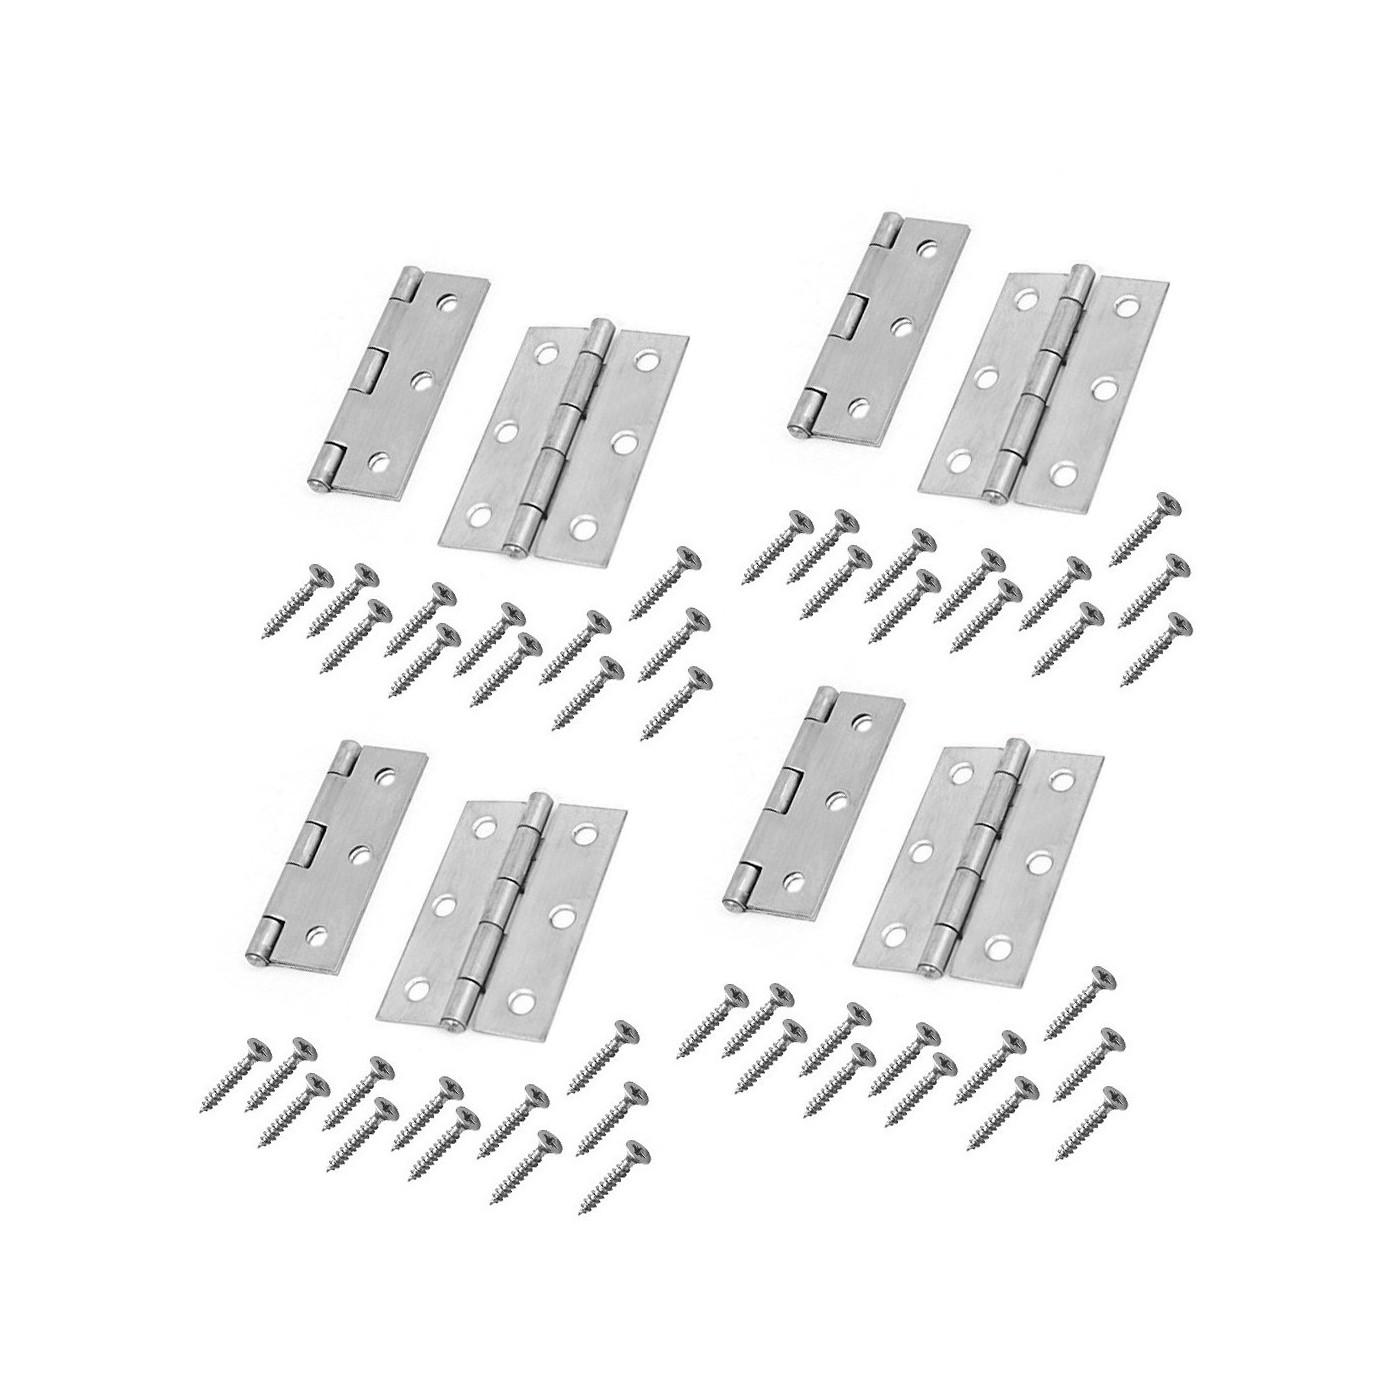 Set of 8 metal hinges, silver color (76x45 mm)